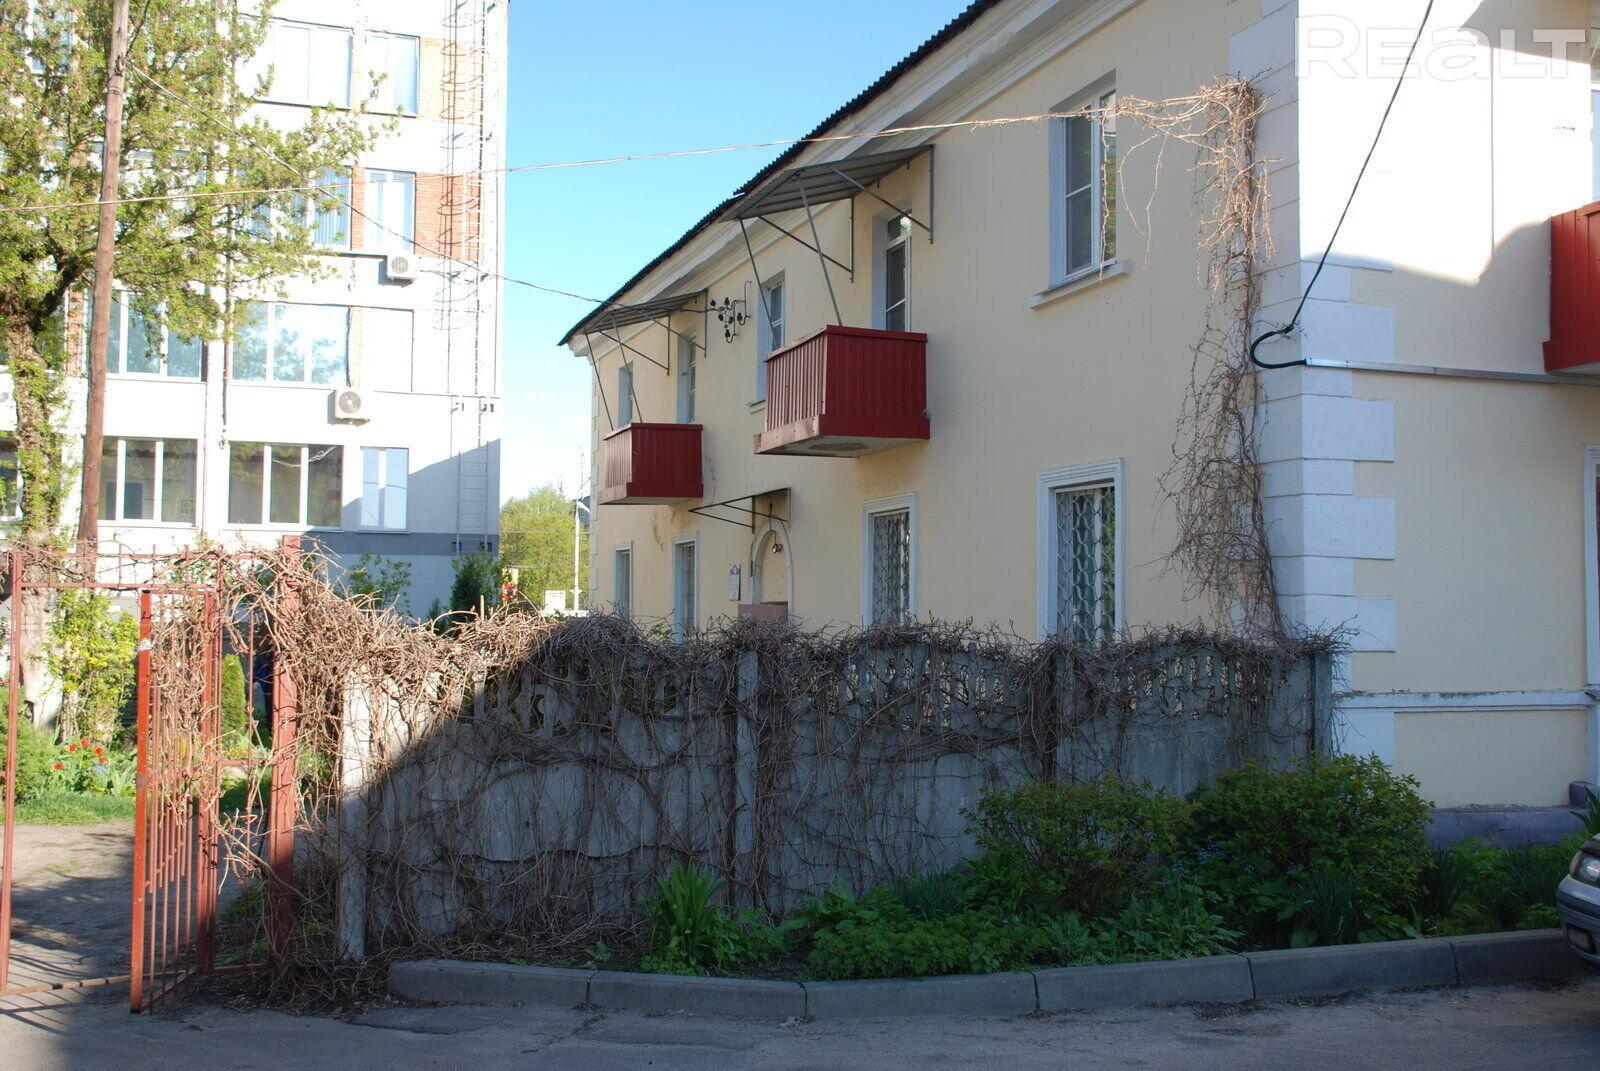 Продажа 3-х комнатной квартиры, г. Гомель, ул. Гагарина, дом 45 (р-н Центр). Цена 89 316 руб